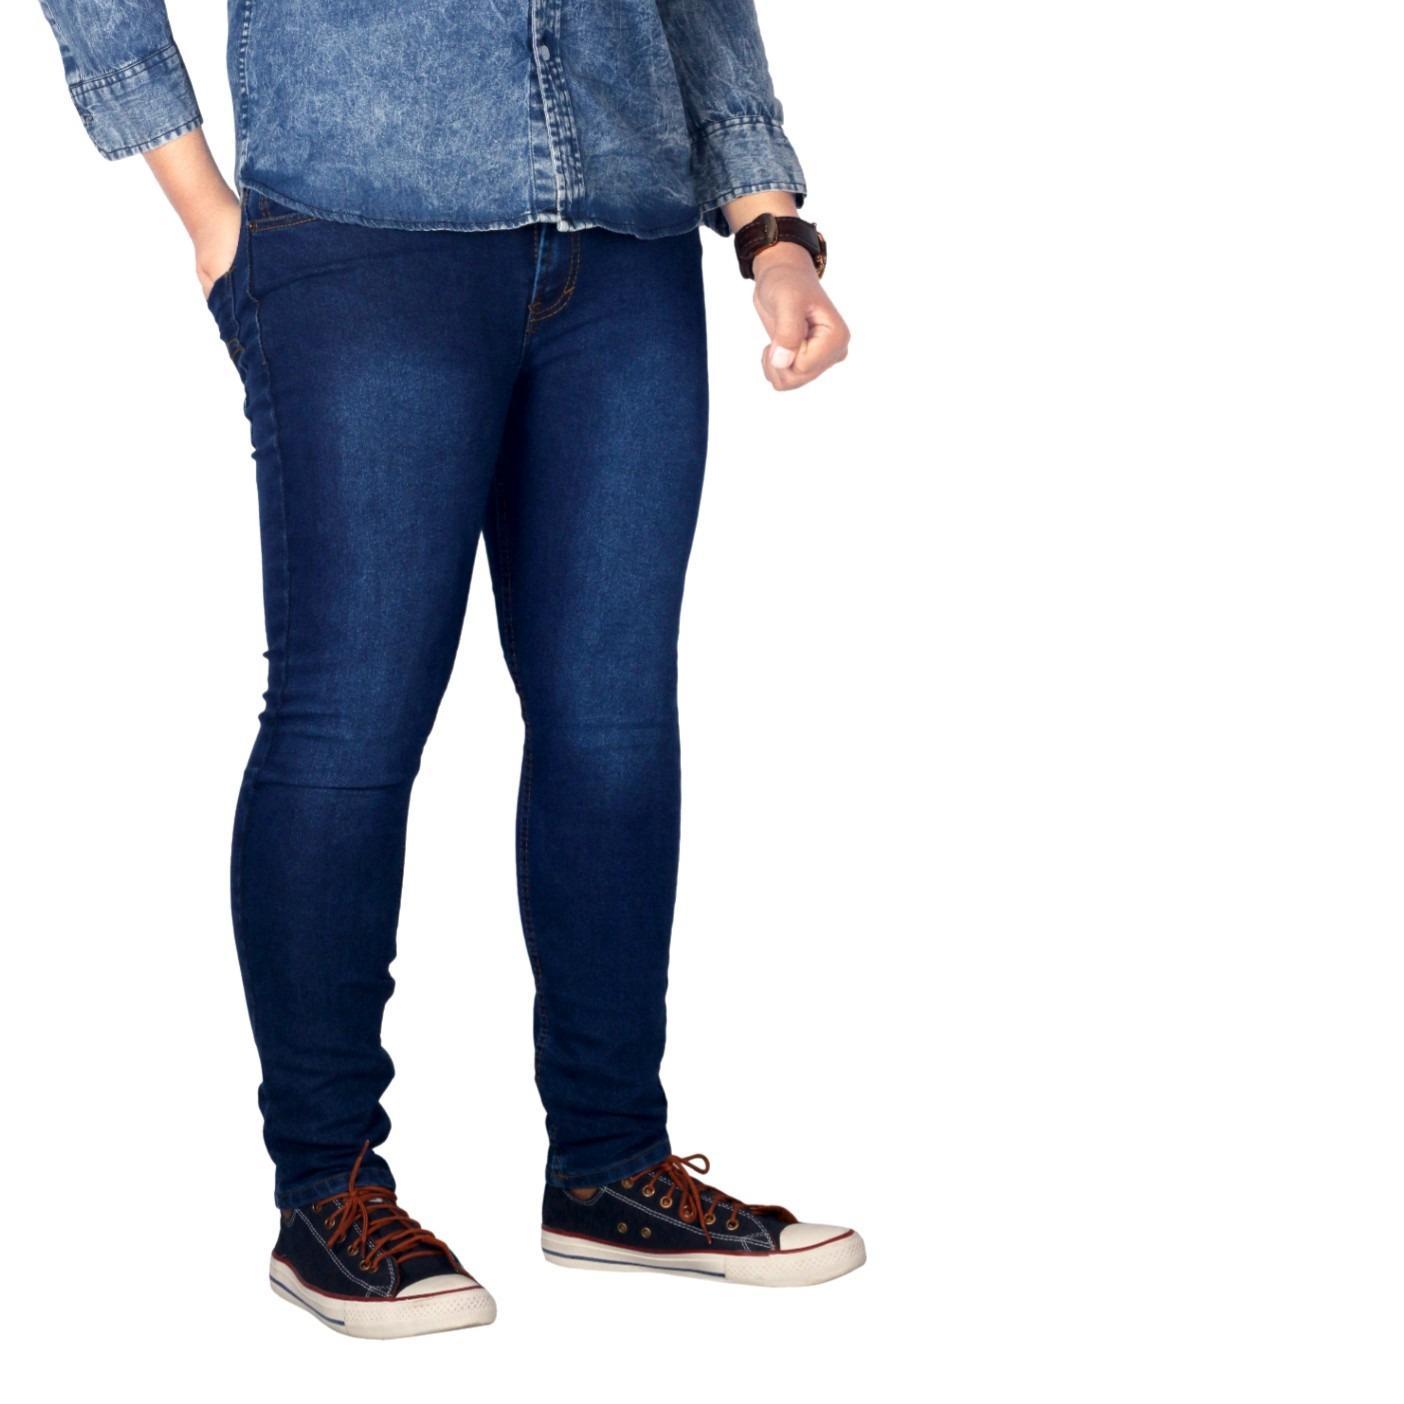 Spesifikasi Dgm Fashion1 Celana Jeans Biru Skinny Wash Denim Celana Lepis Celana Jeans Skinny Pria Celana Panjang Celana Pria Celana Casual Celana Denim Celana Jeans Hitam Jeans Polos Celana Jeans Pensil An 5522 Dan Harga